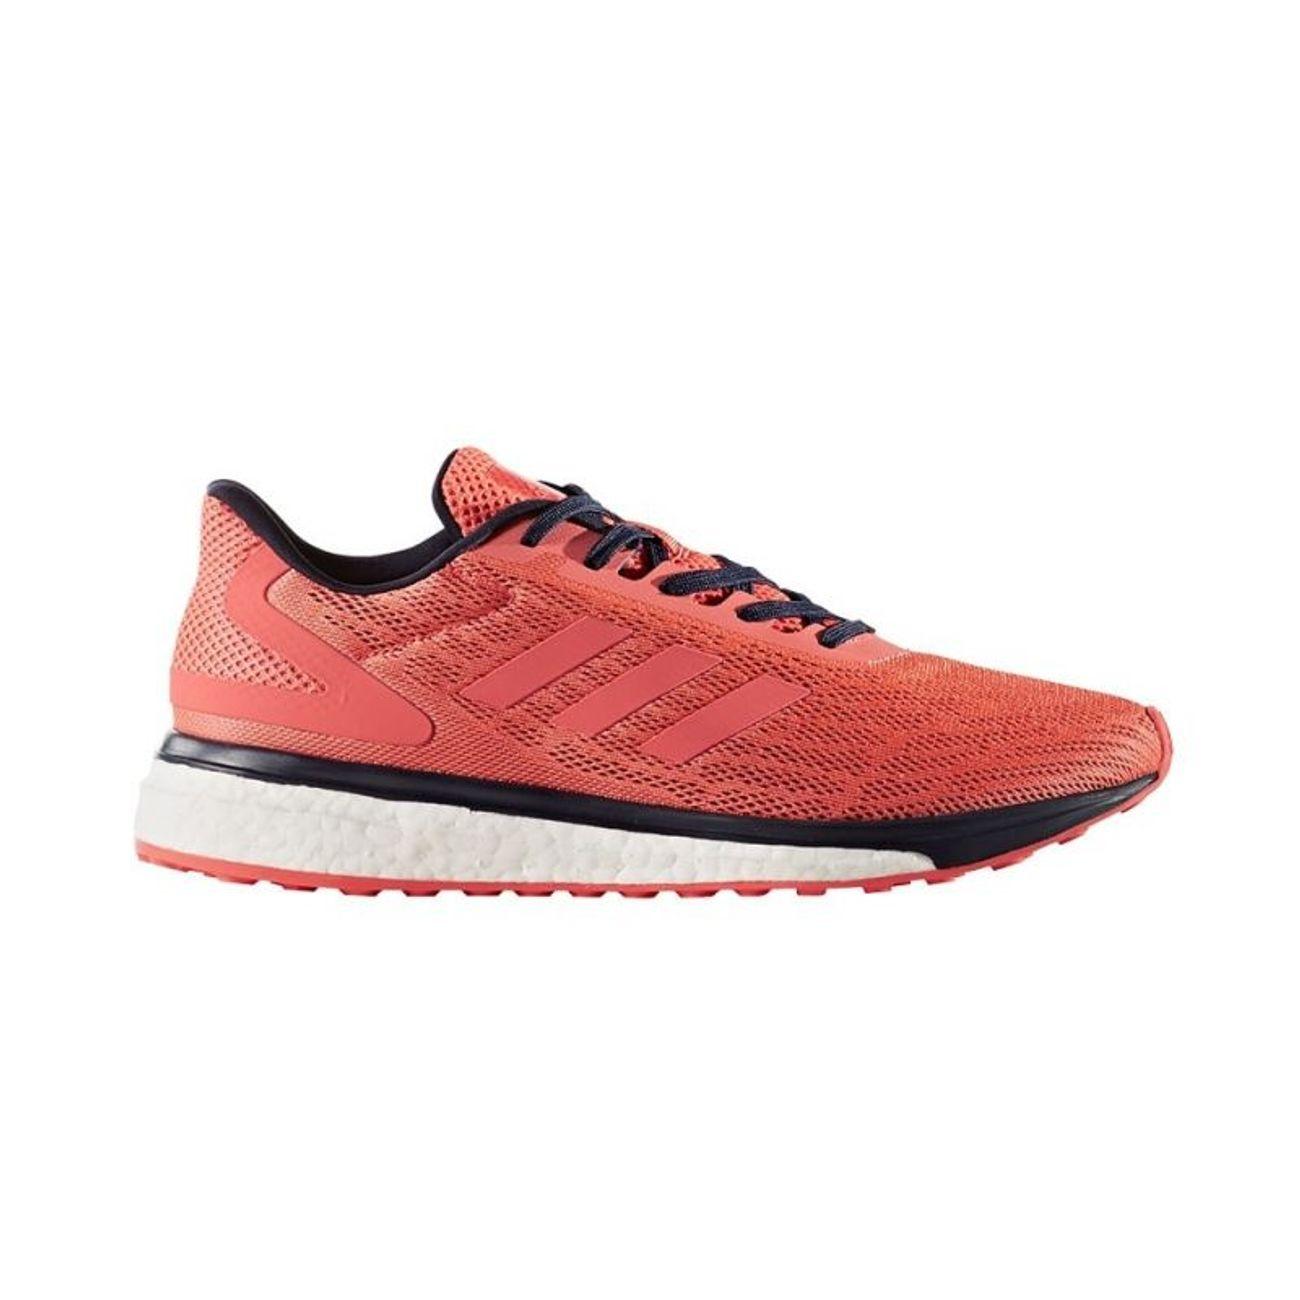 Adidas Response 2 chaussures de running pour femmes corail